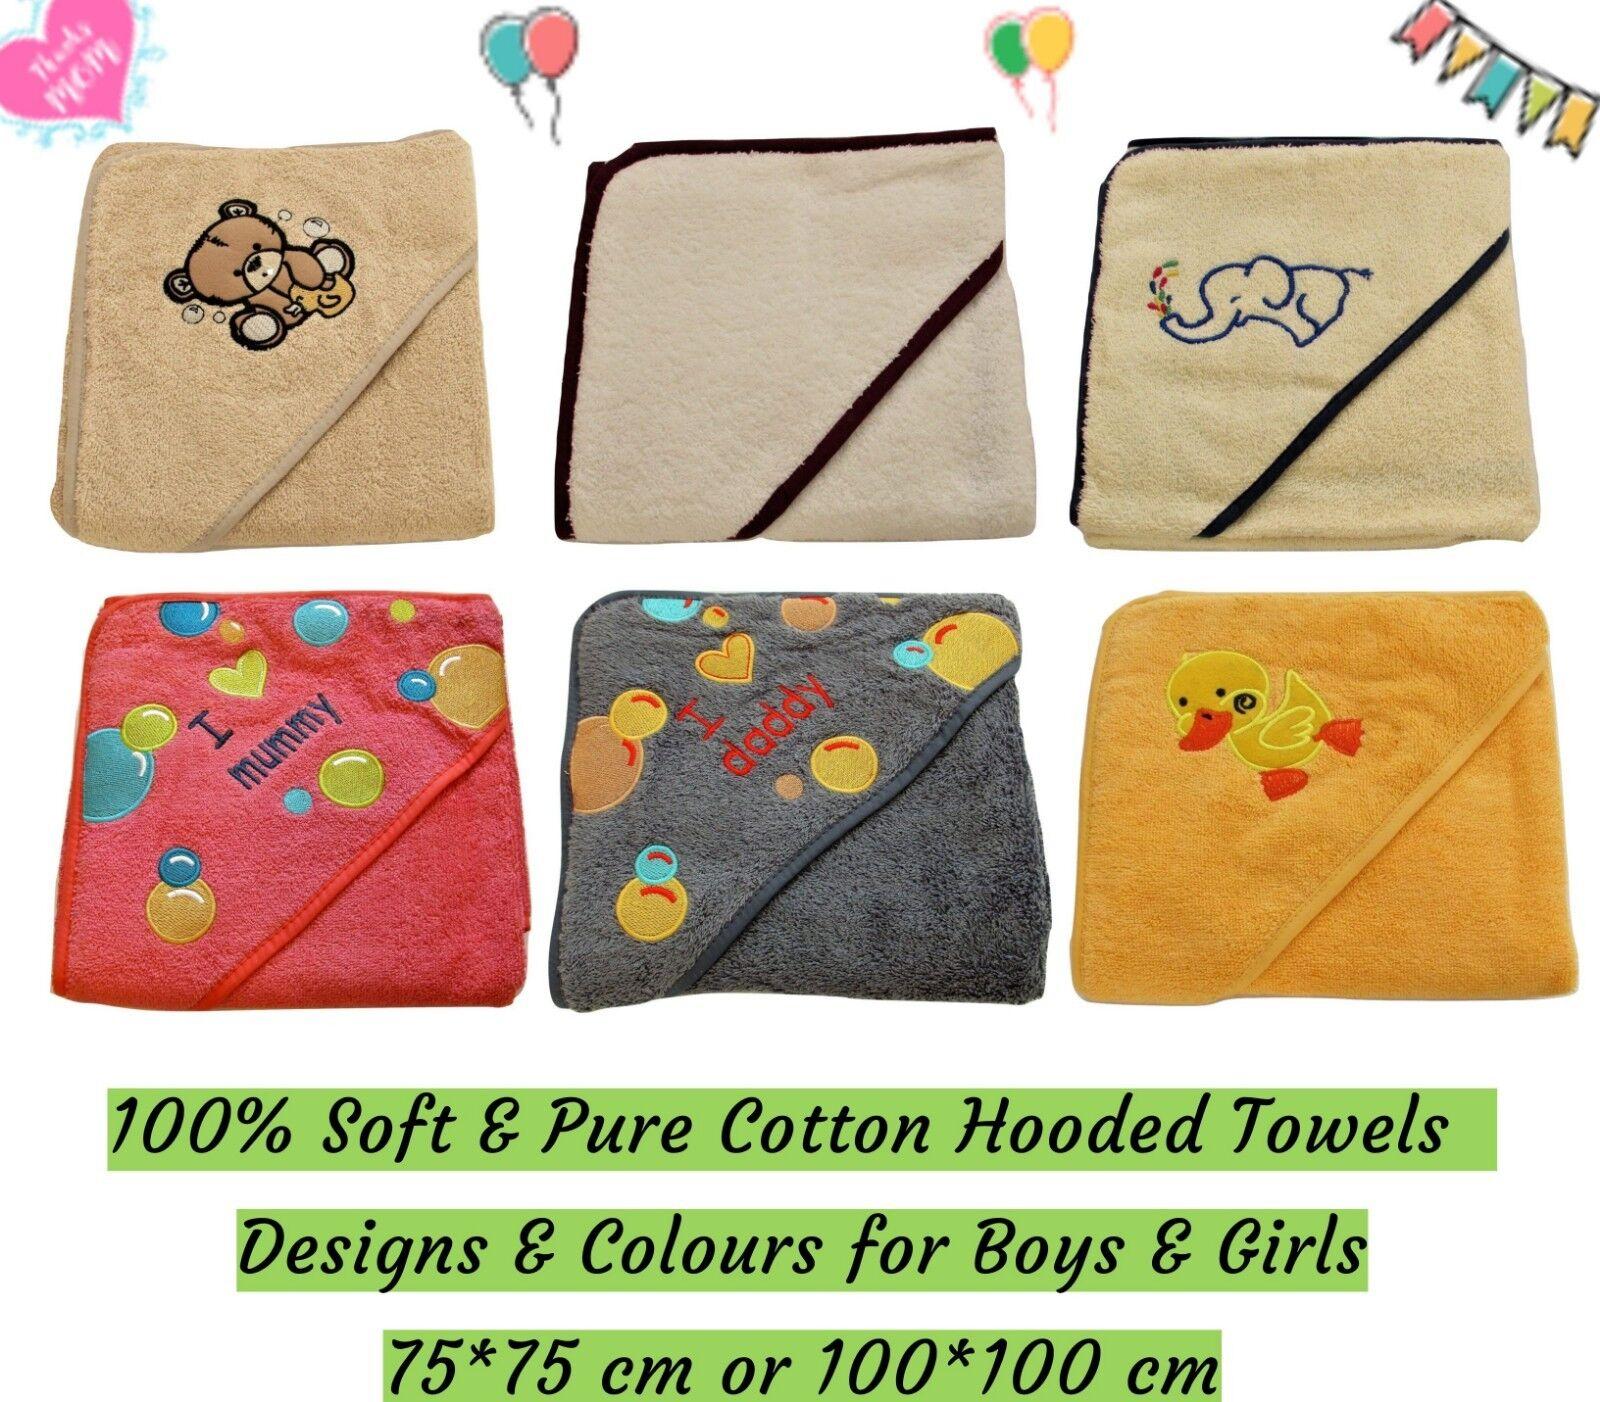 100% Cotton Baby Hooded Towel Bath Sheet Infant Boys Girls U